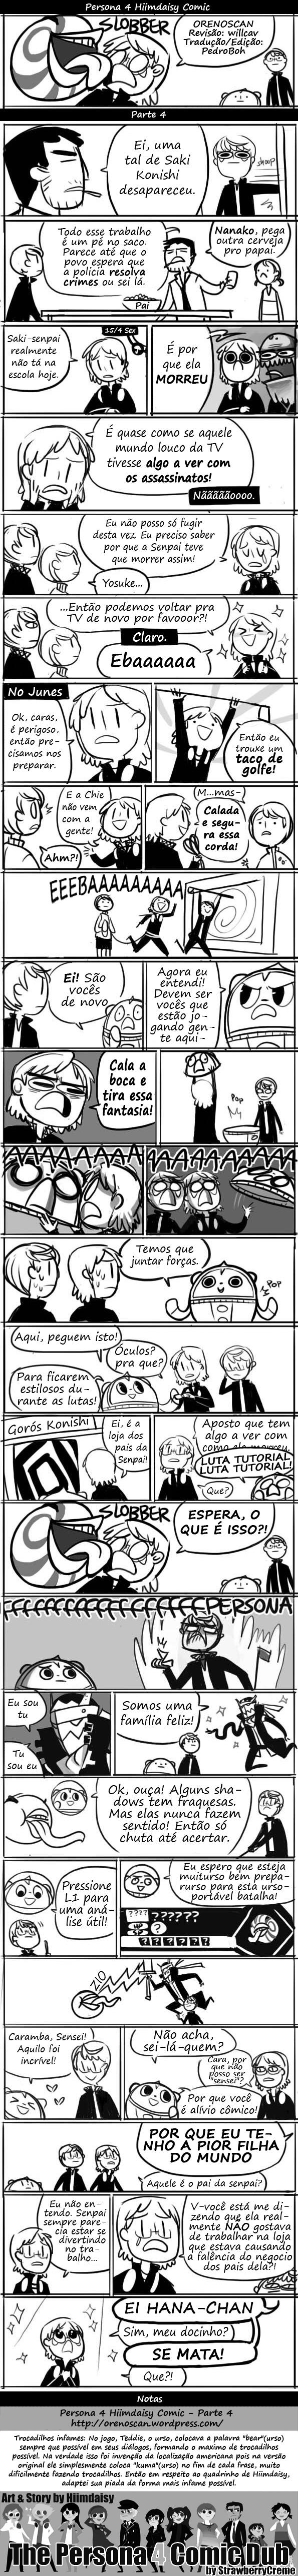 [OreNoScan]-Persona-4-Hiimdaisy-Comic---Parte-4